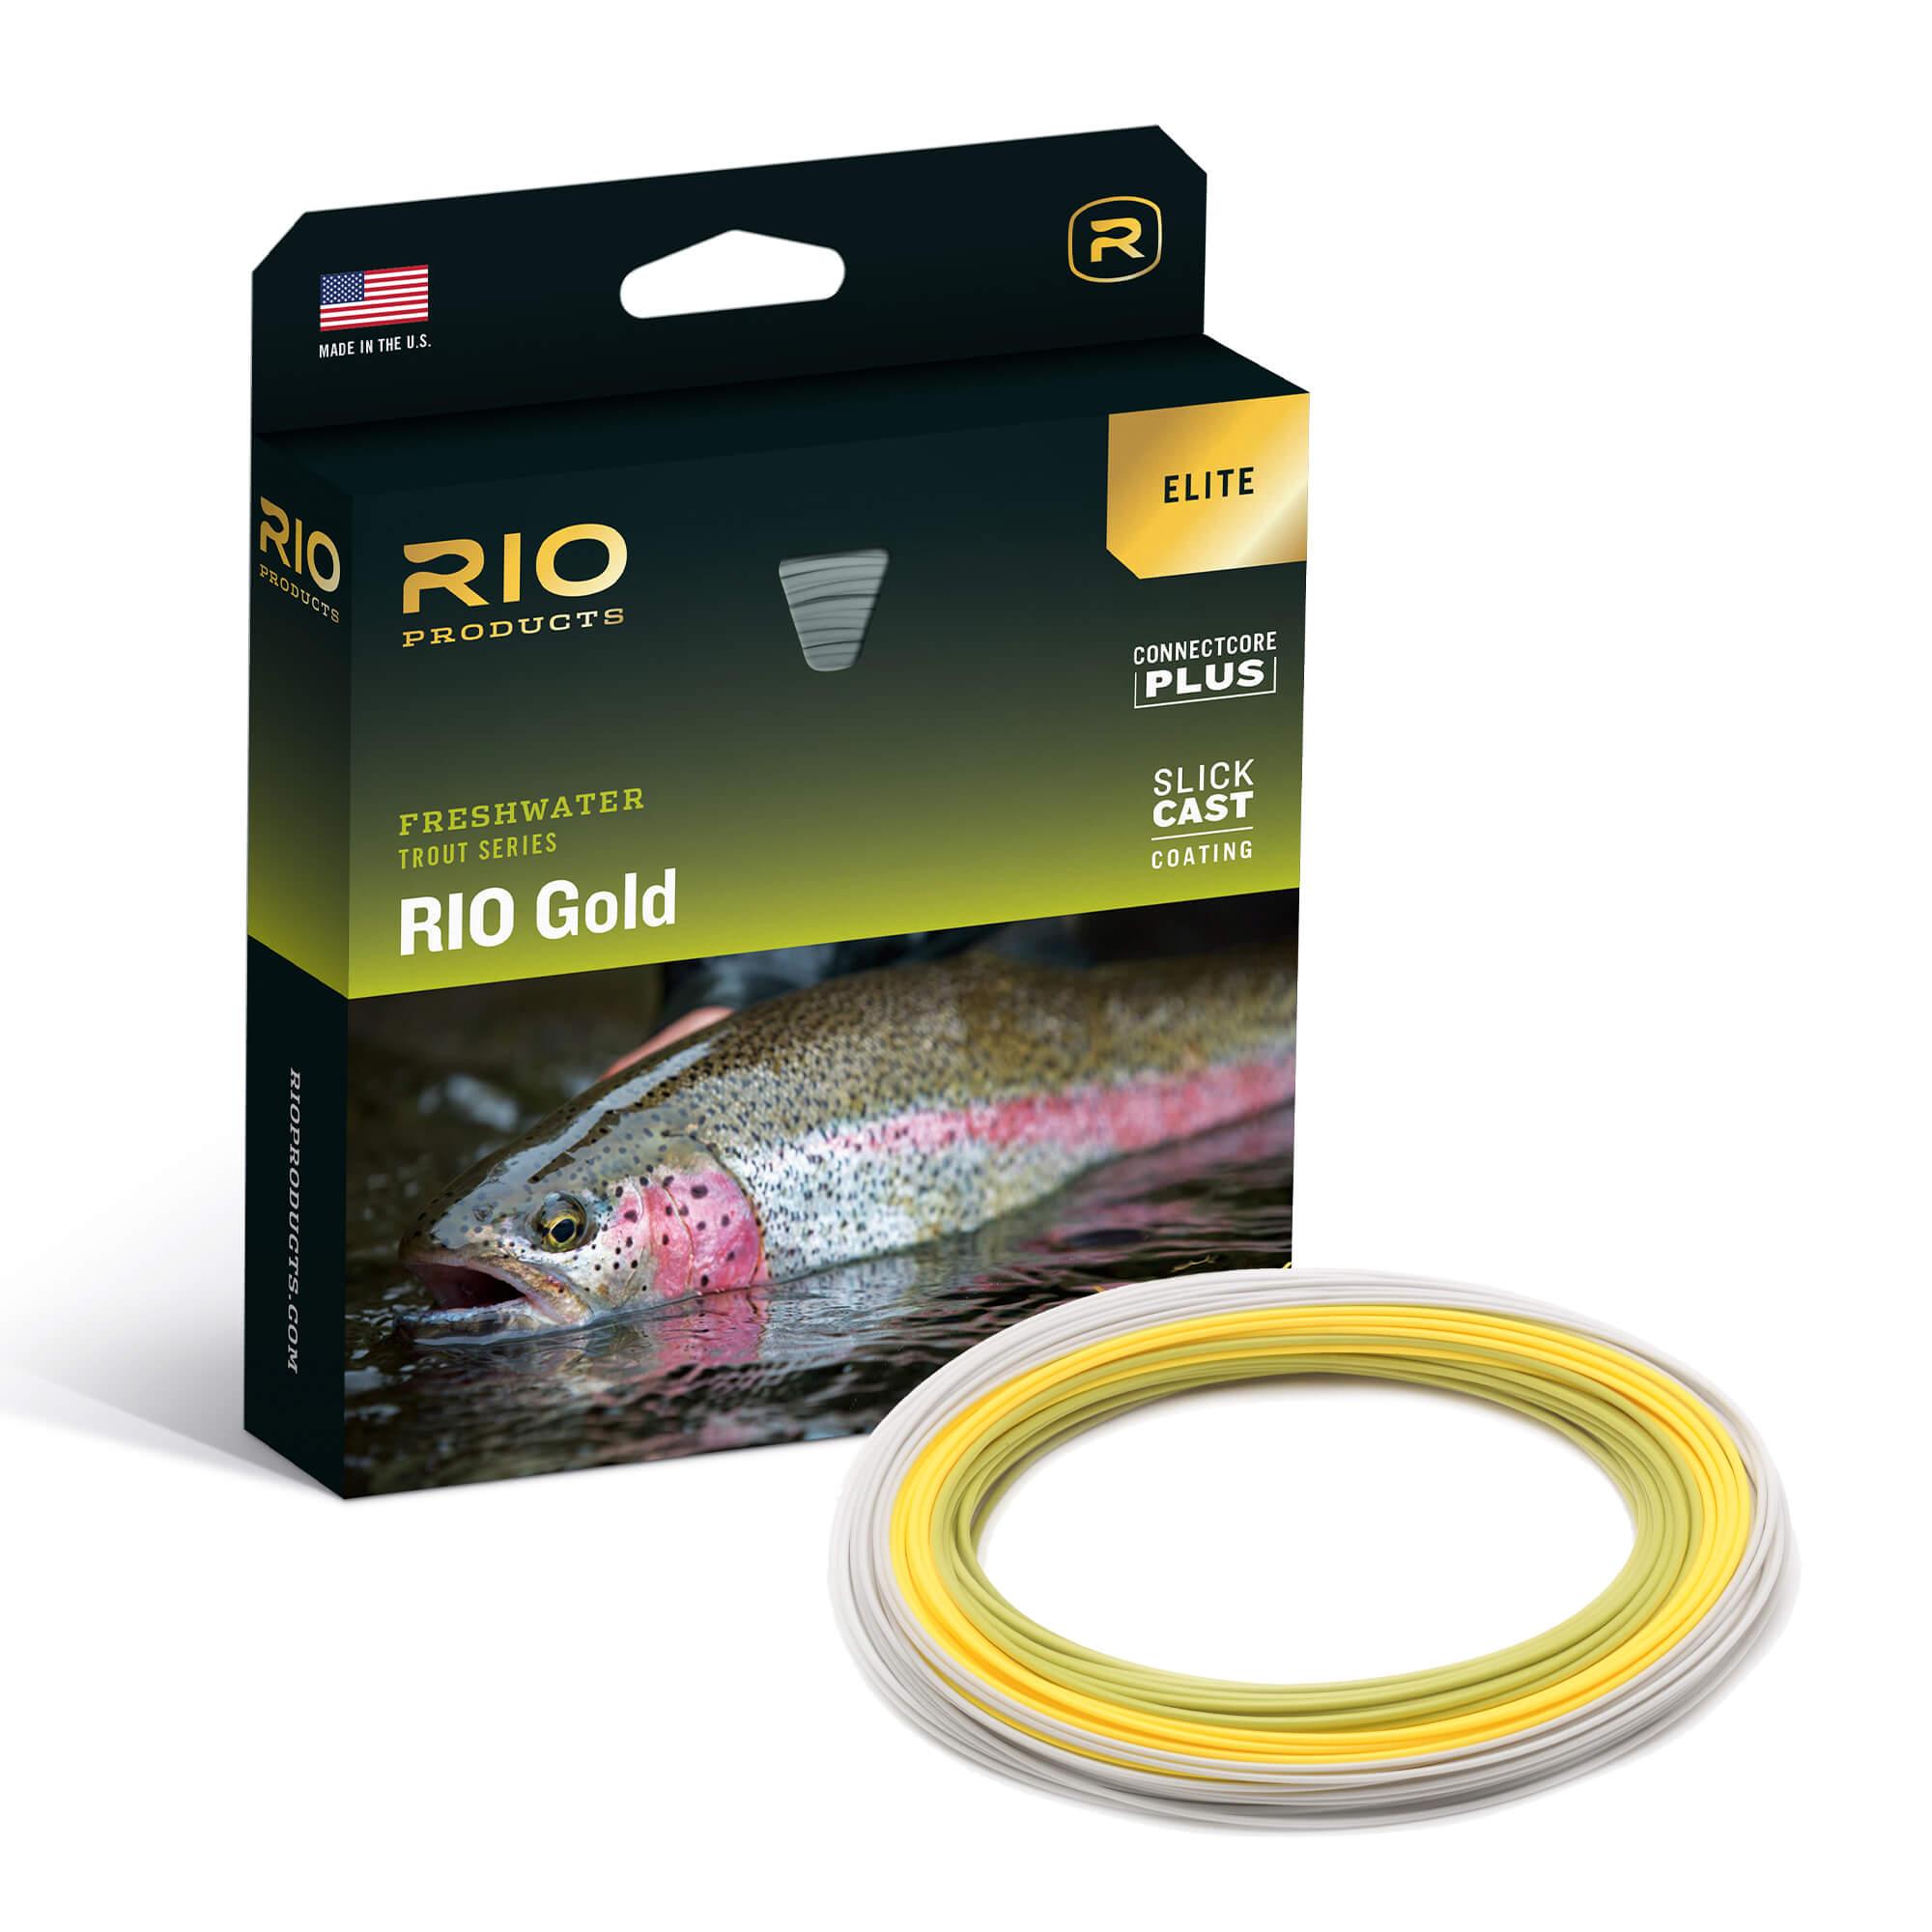 RIO SLICKCAST GOLD ELITE FLY LINE BOX